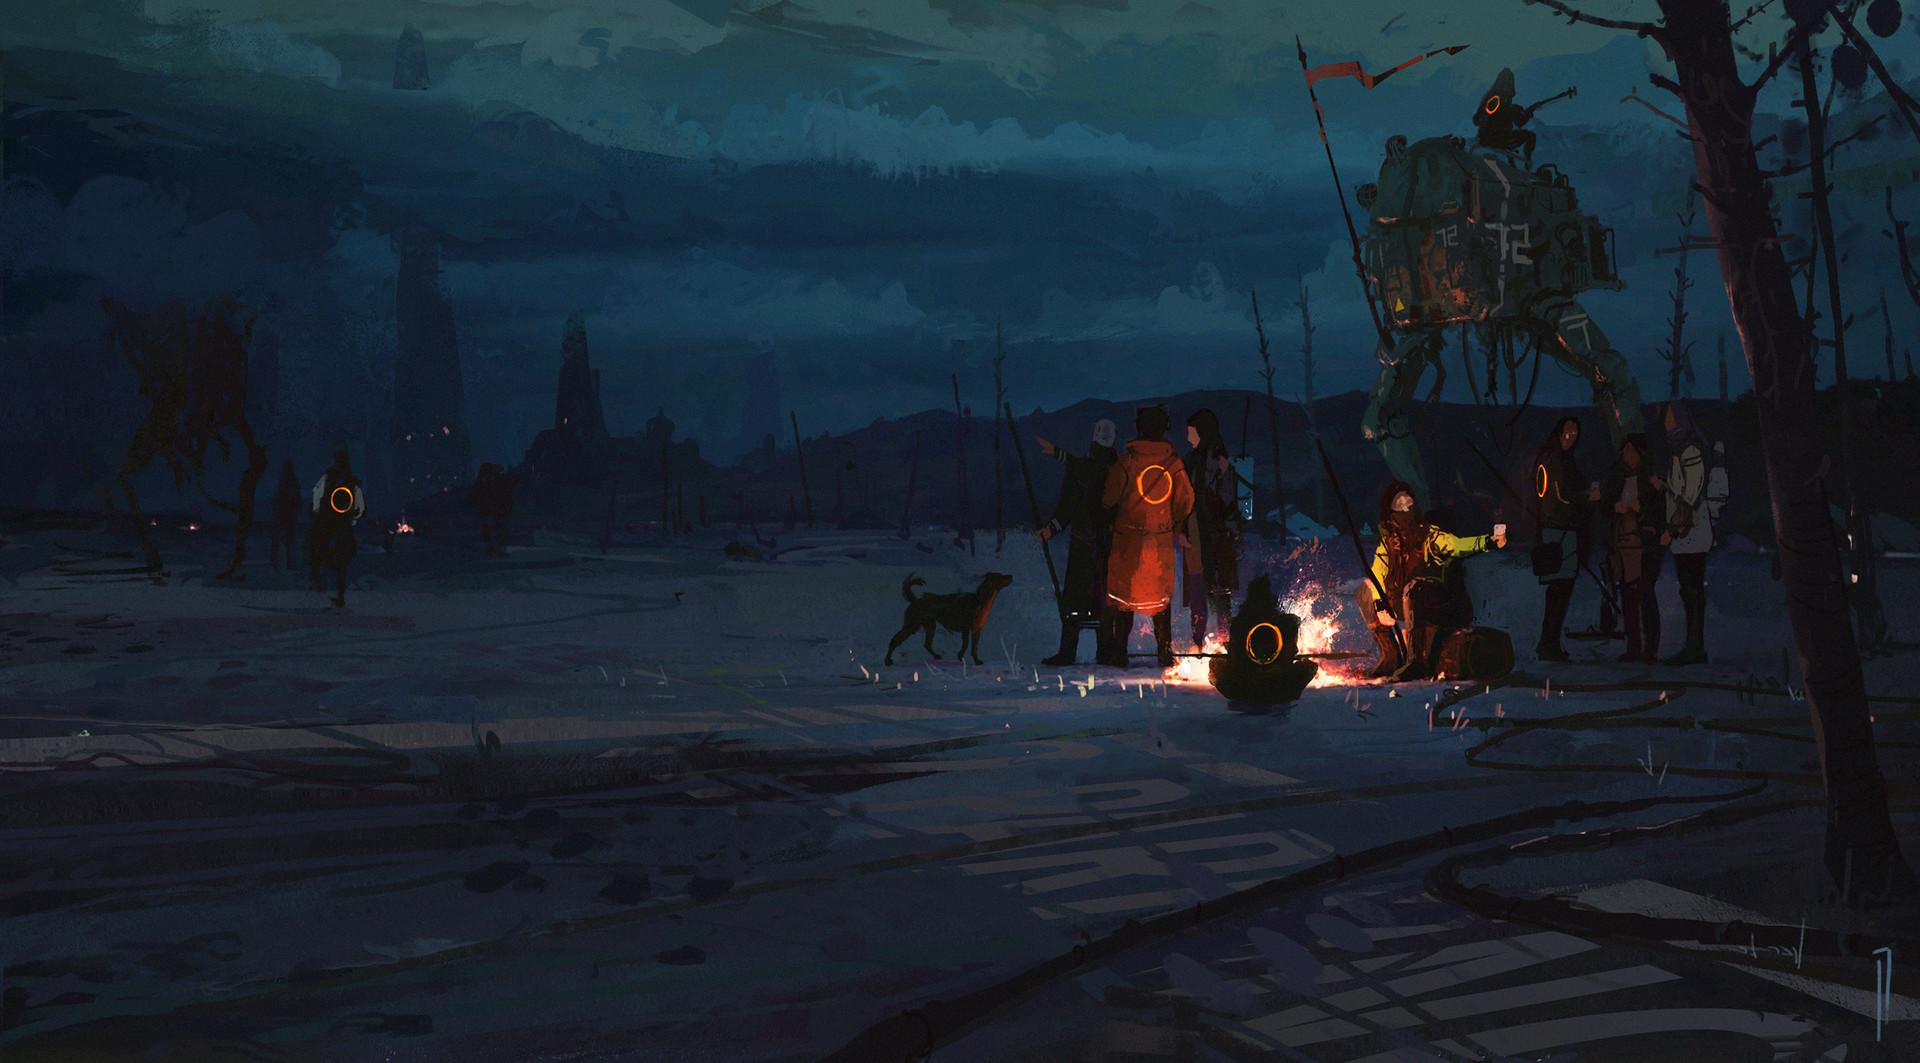 Ismail inceoglu midnight tale